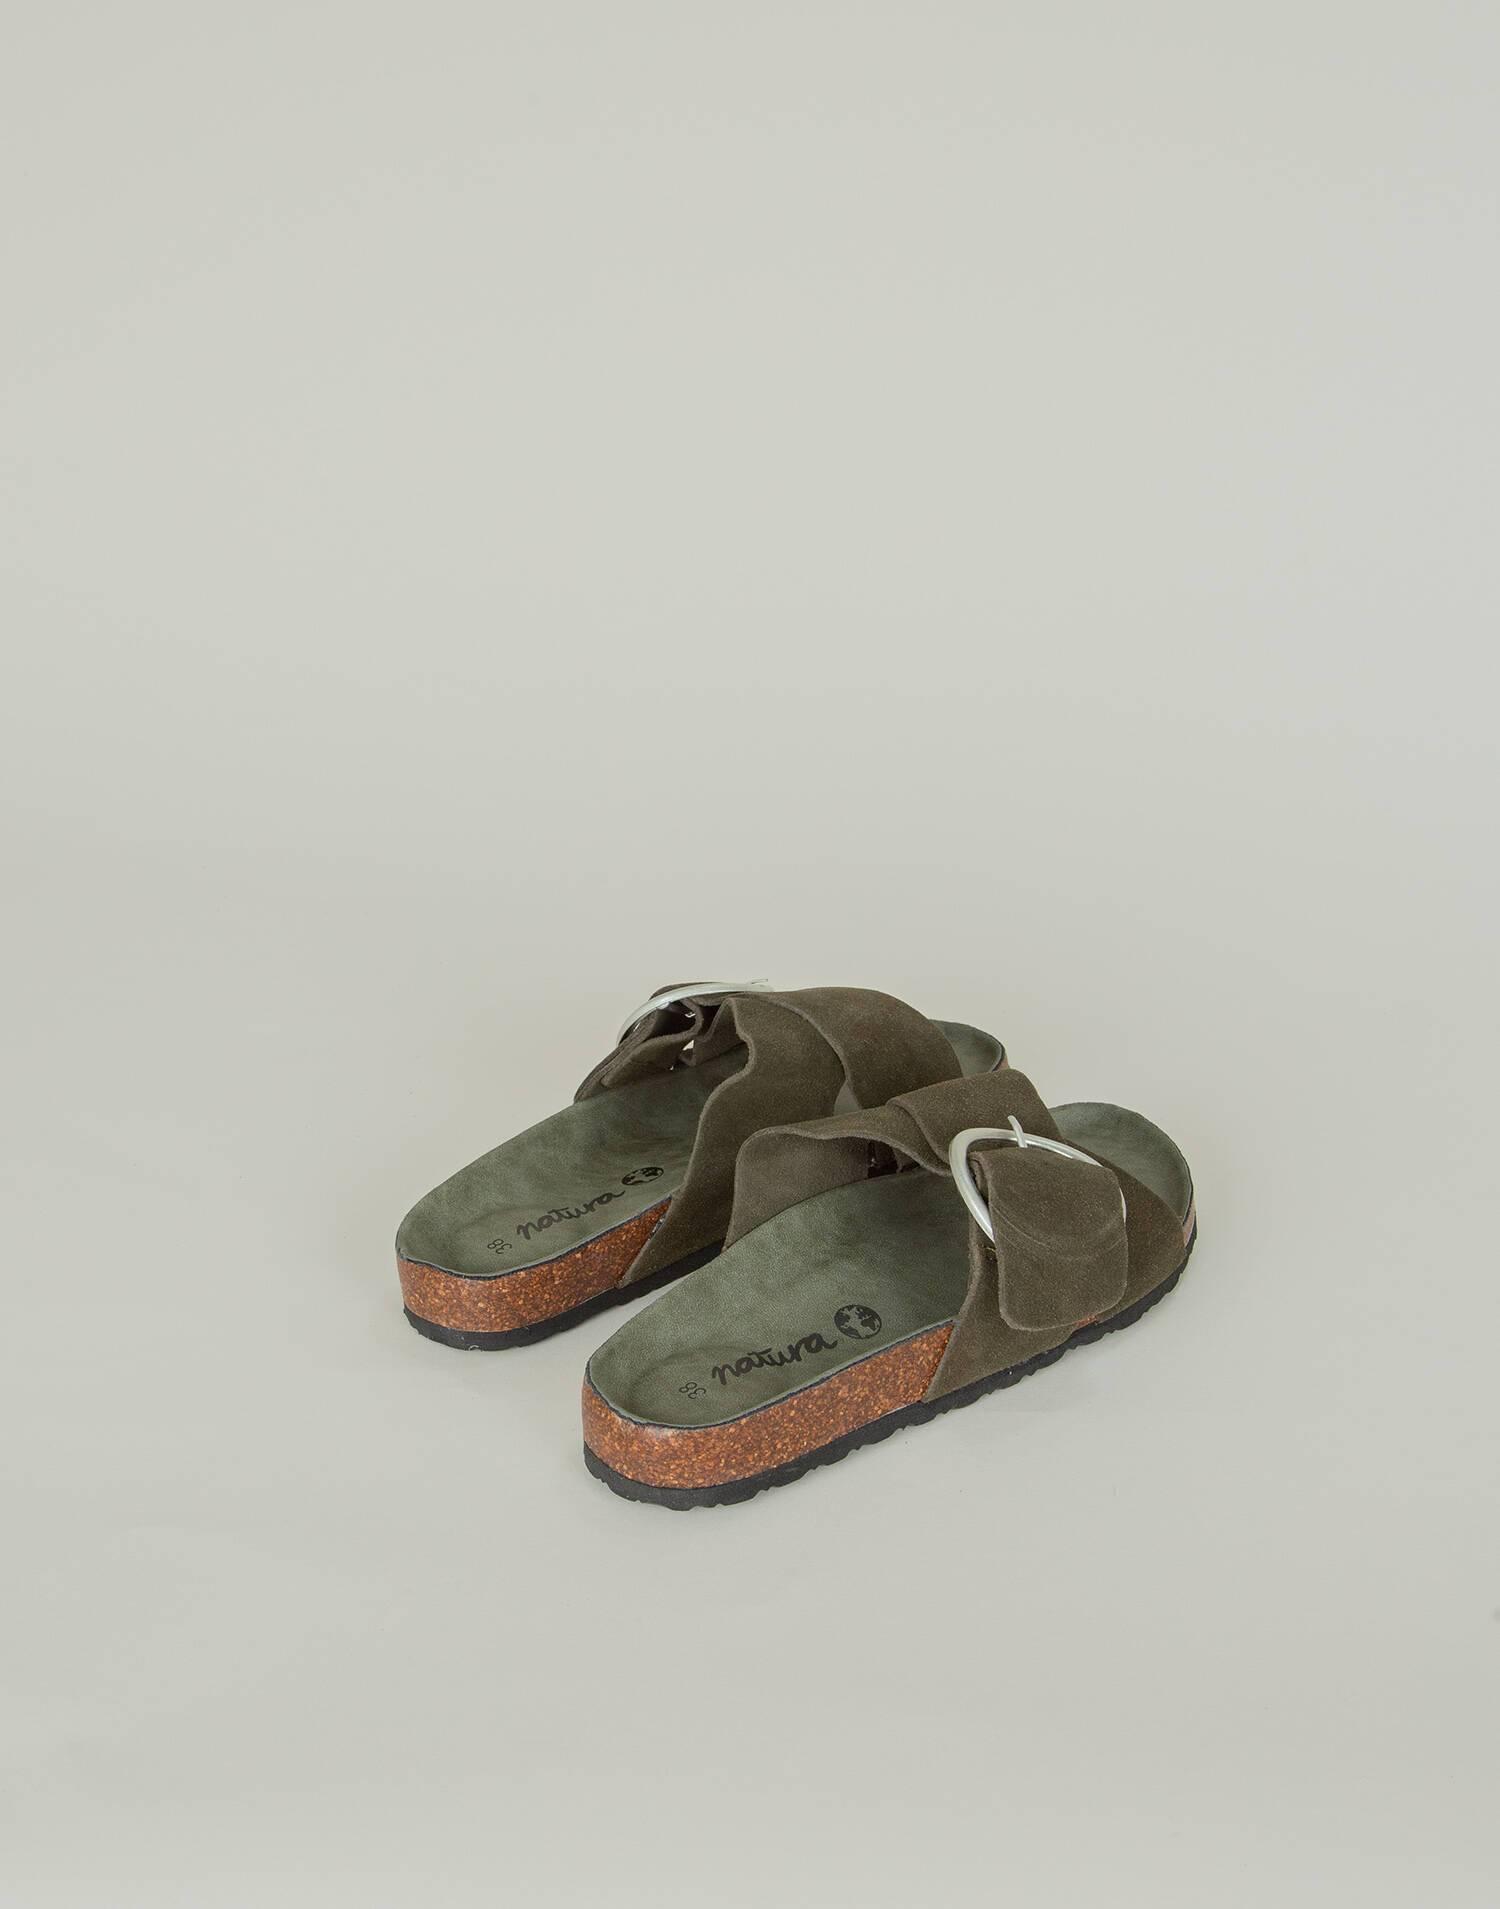 Crossed strap ergonomic leather sandal